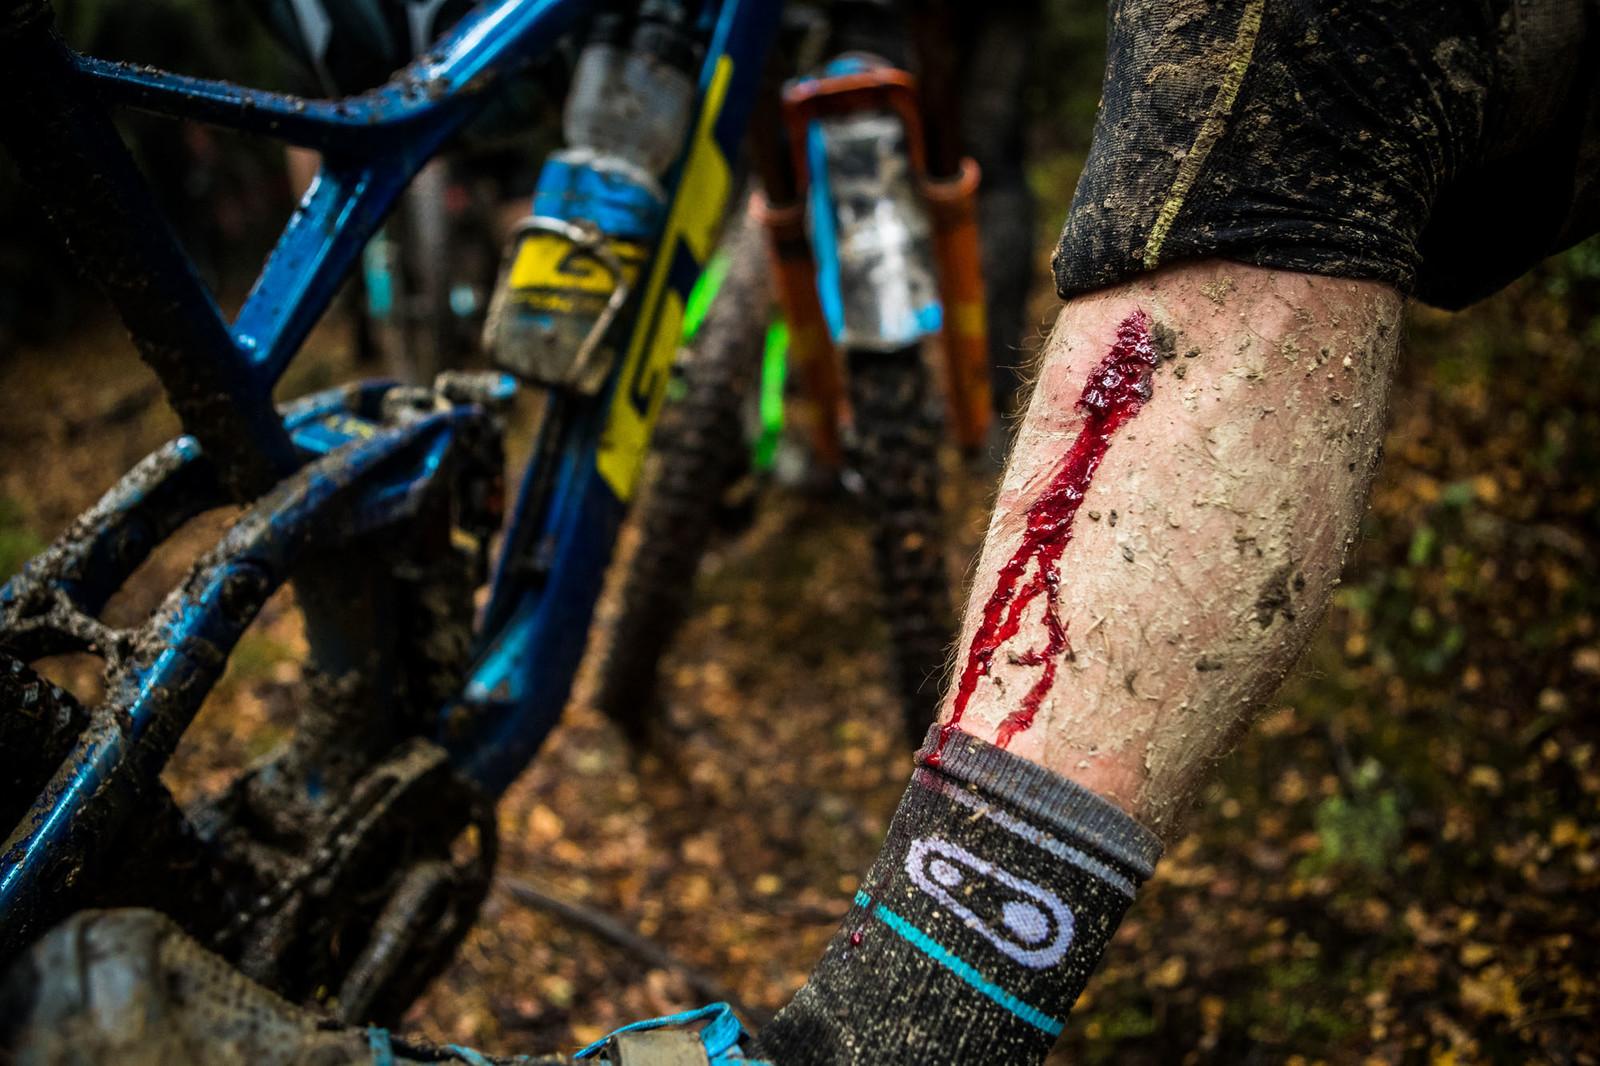 NZEnduro19 BB AS6I0298 - 2019 NZ Enduro Day 1 Photo Gallery - Mountain Biking Pictures - Vital MTB